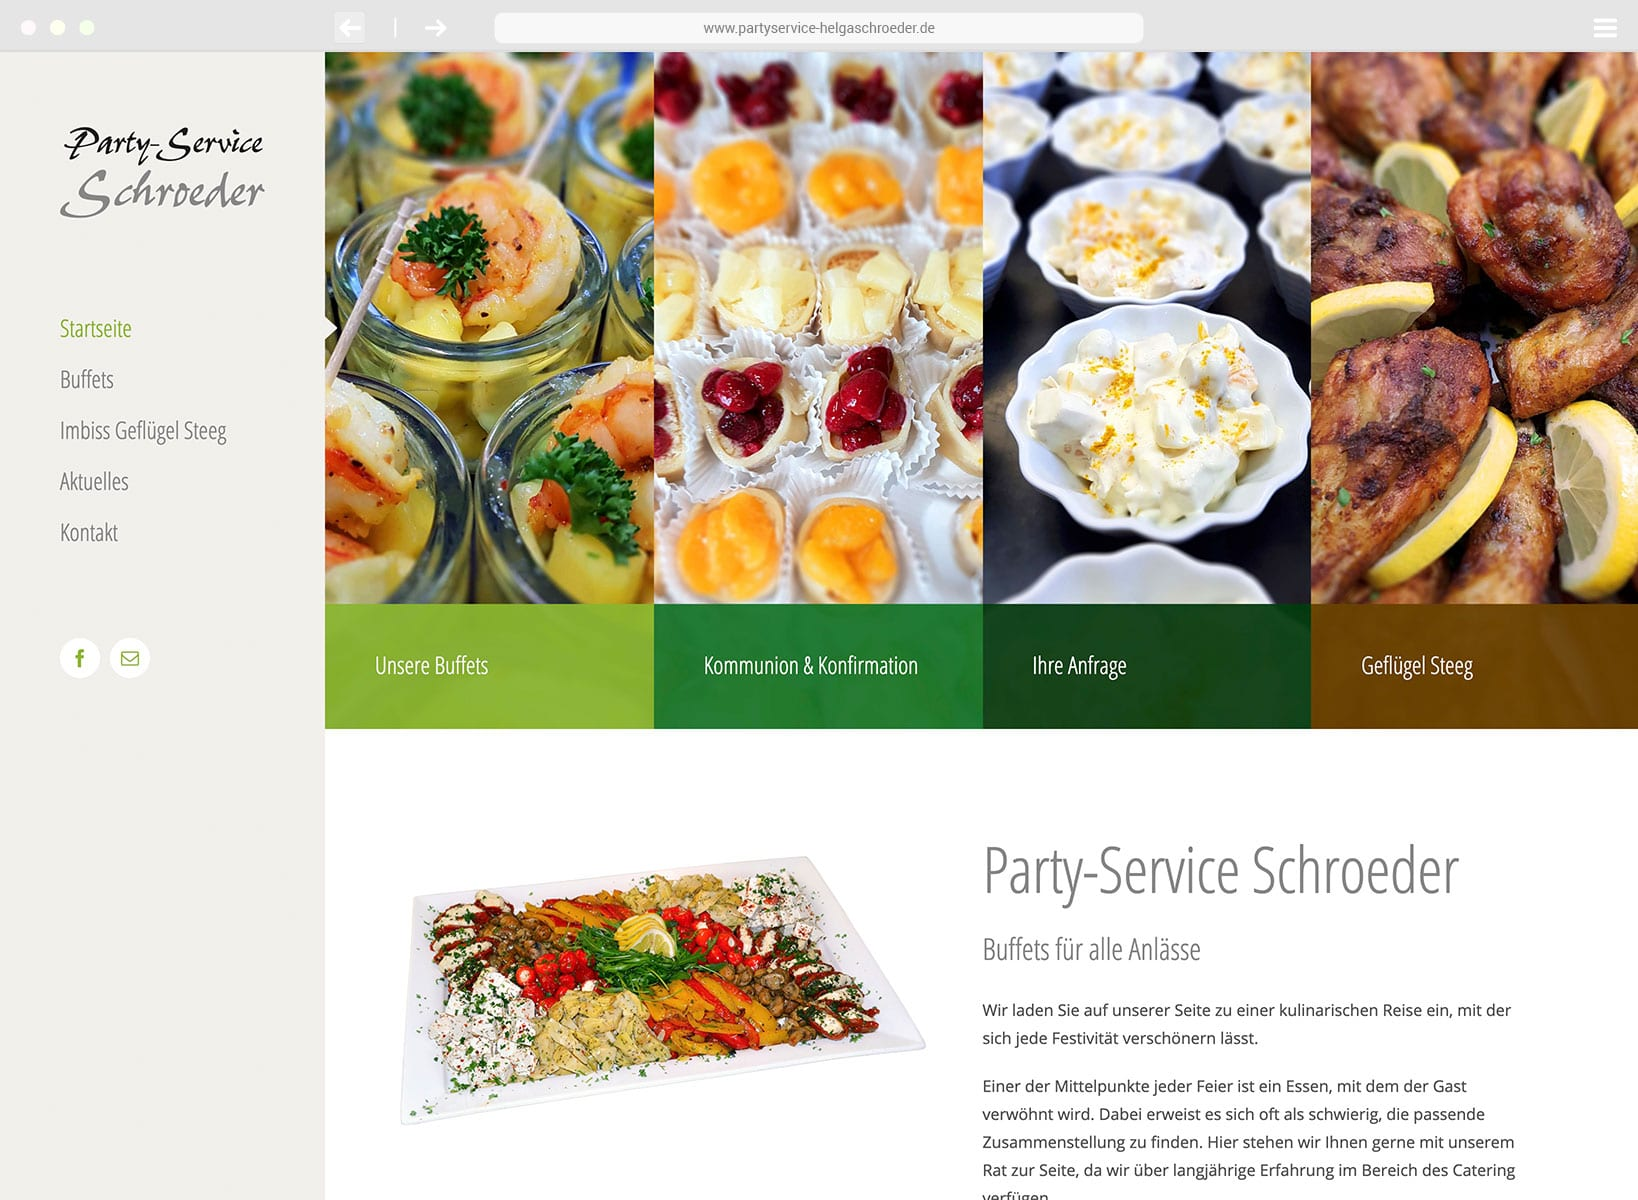 www.partyservice-helgaschroeder.de